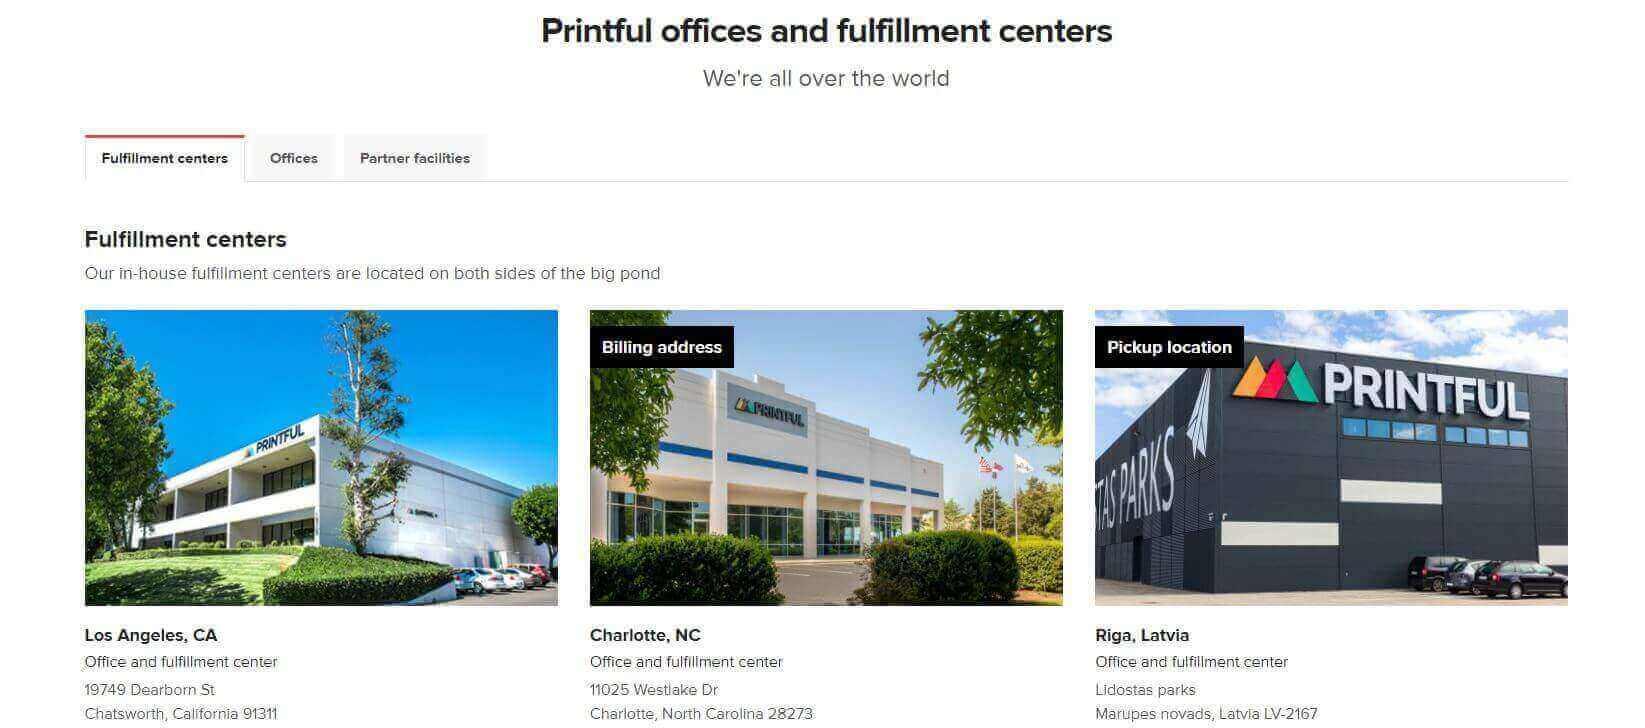 Printful Fulfillment Centers